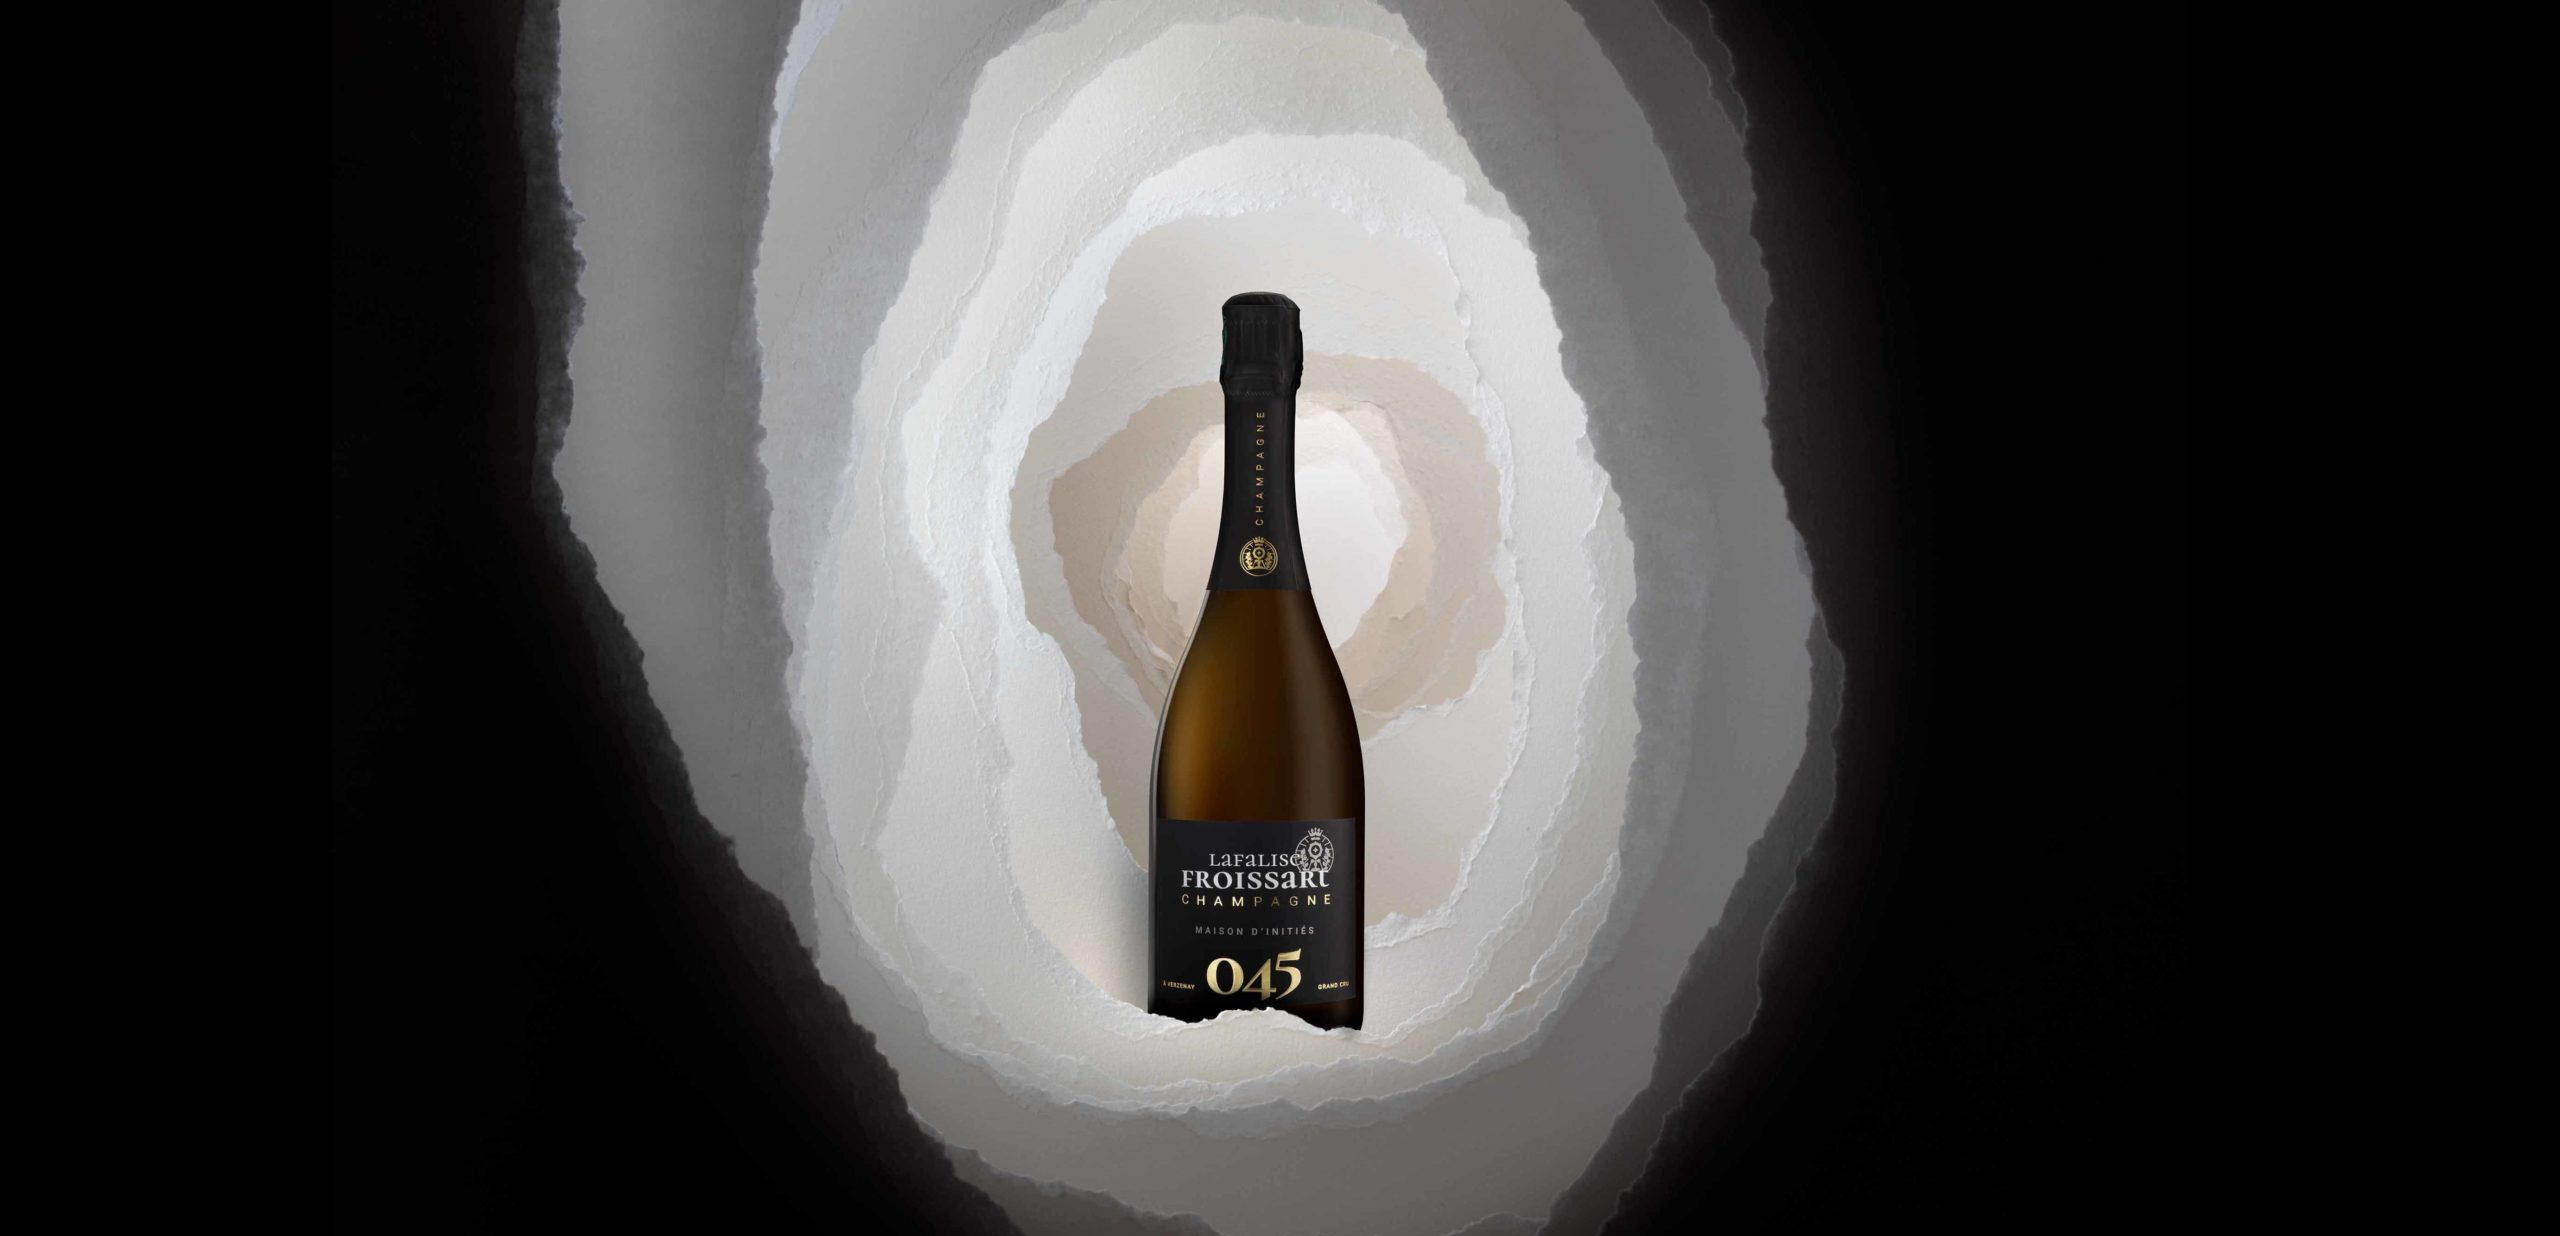 Packshot artistique cuvée 045 du Champagne Lafalise Froissart